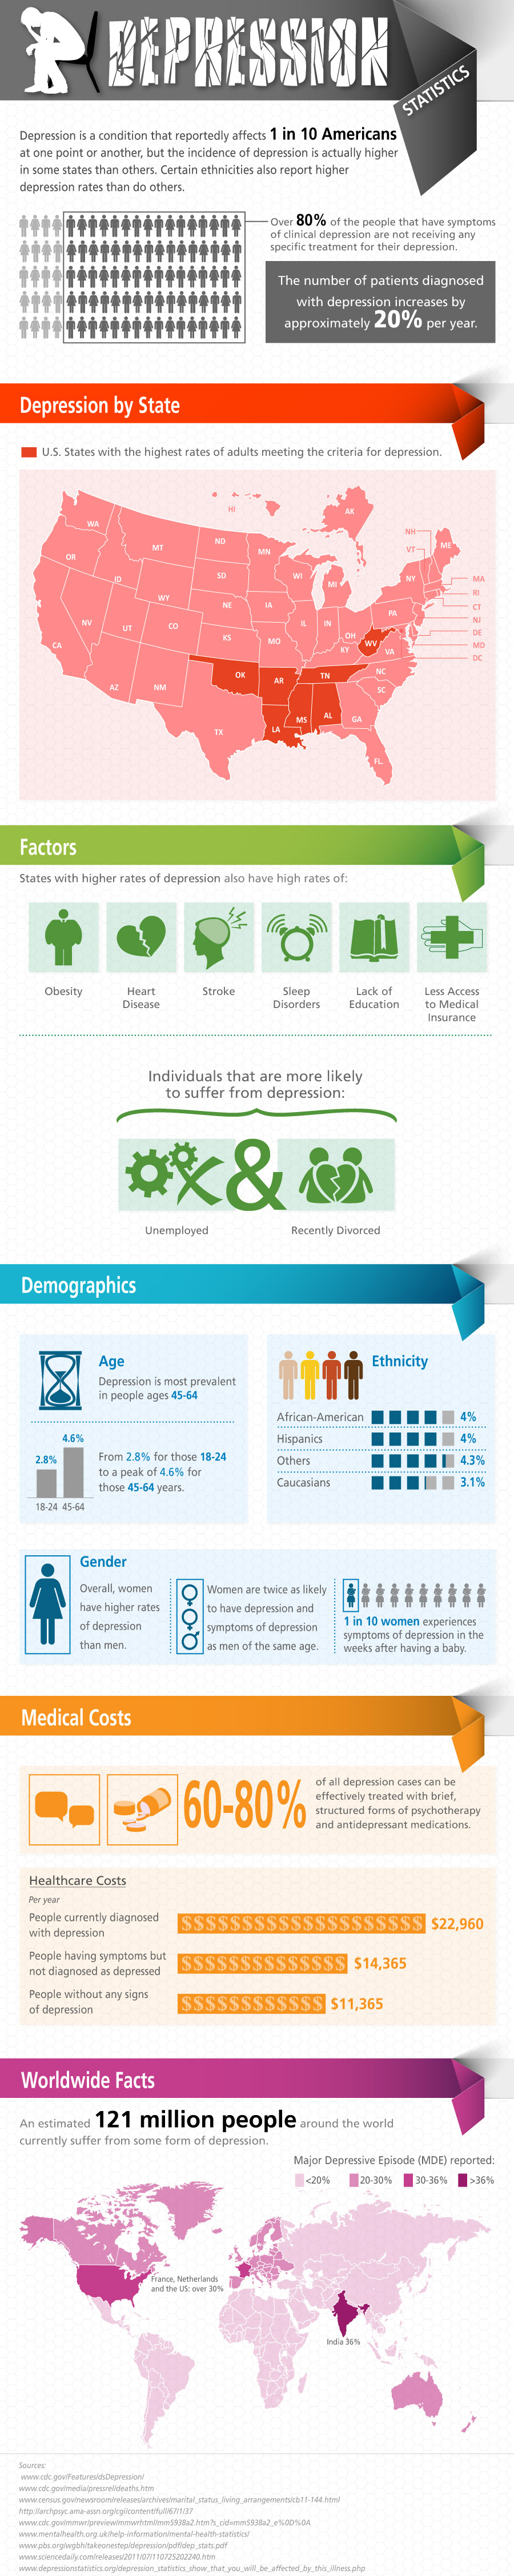 depression statistics infographic